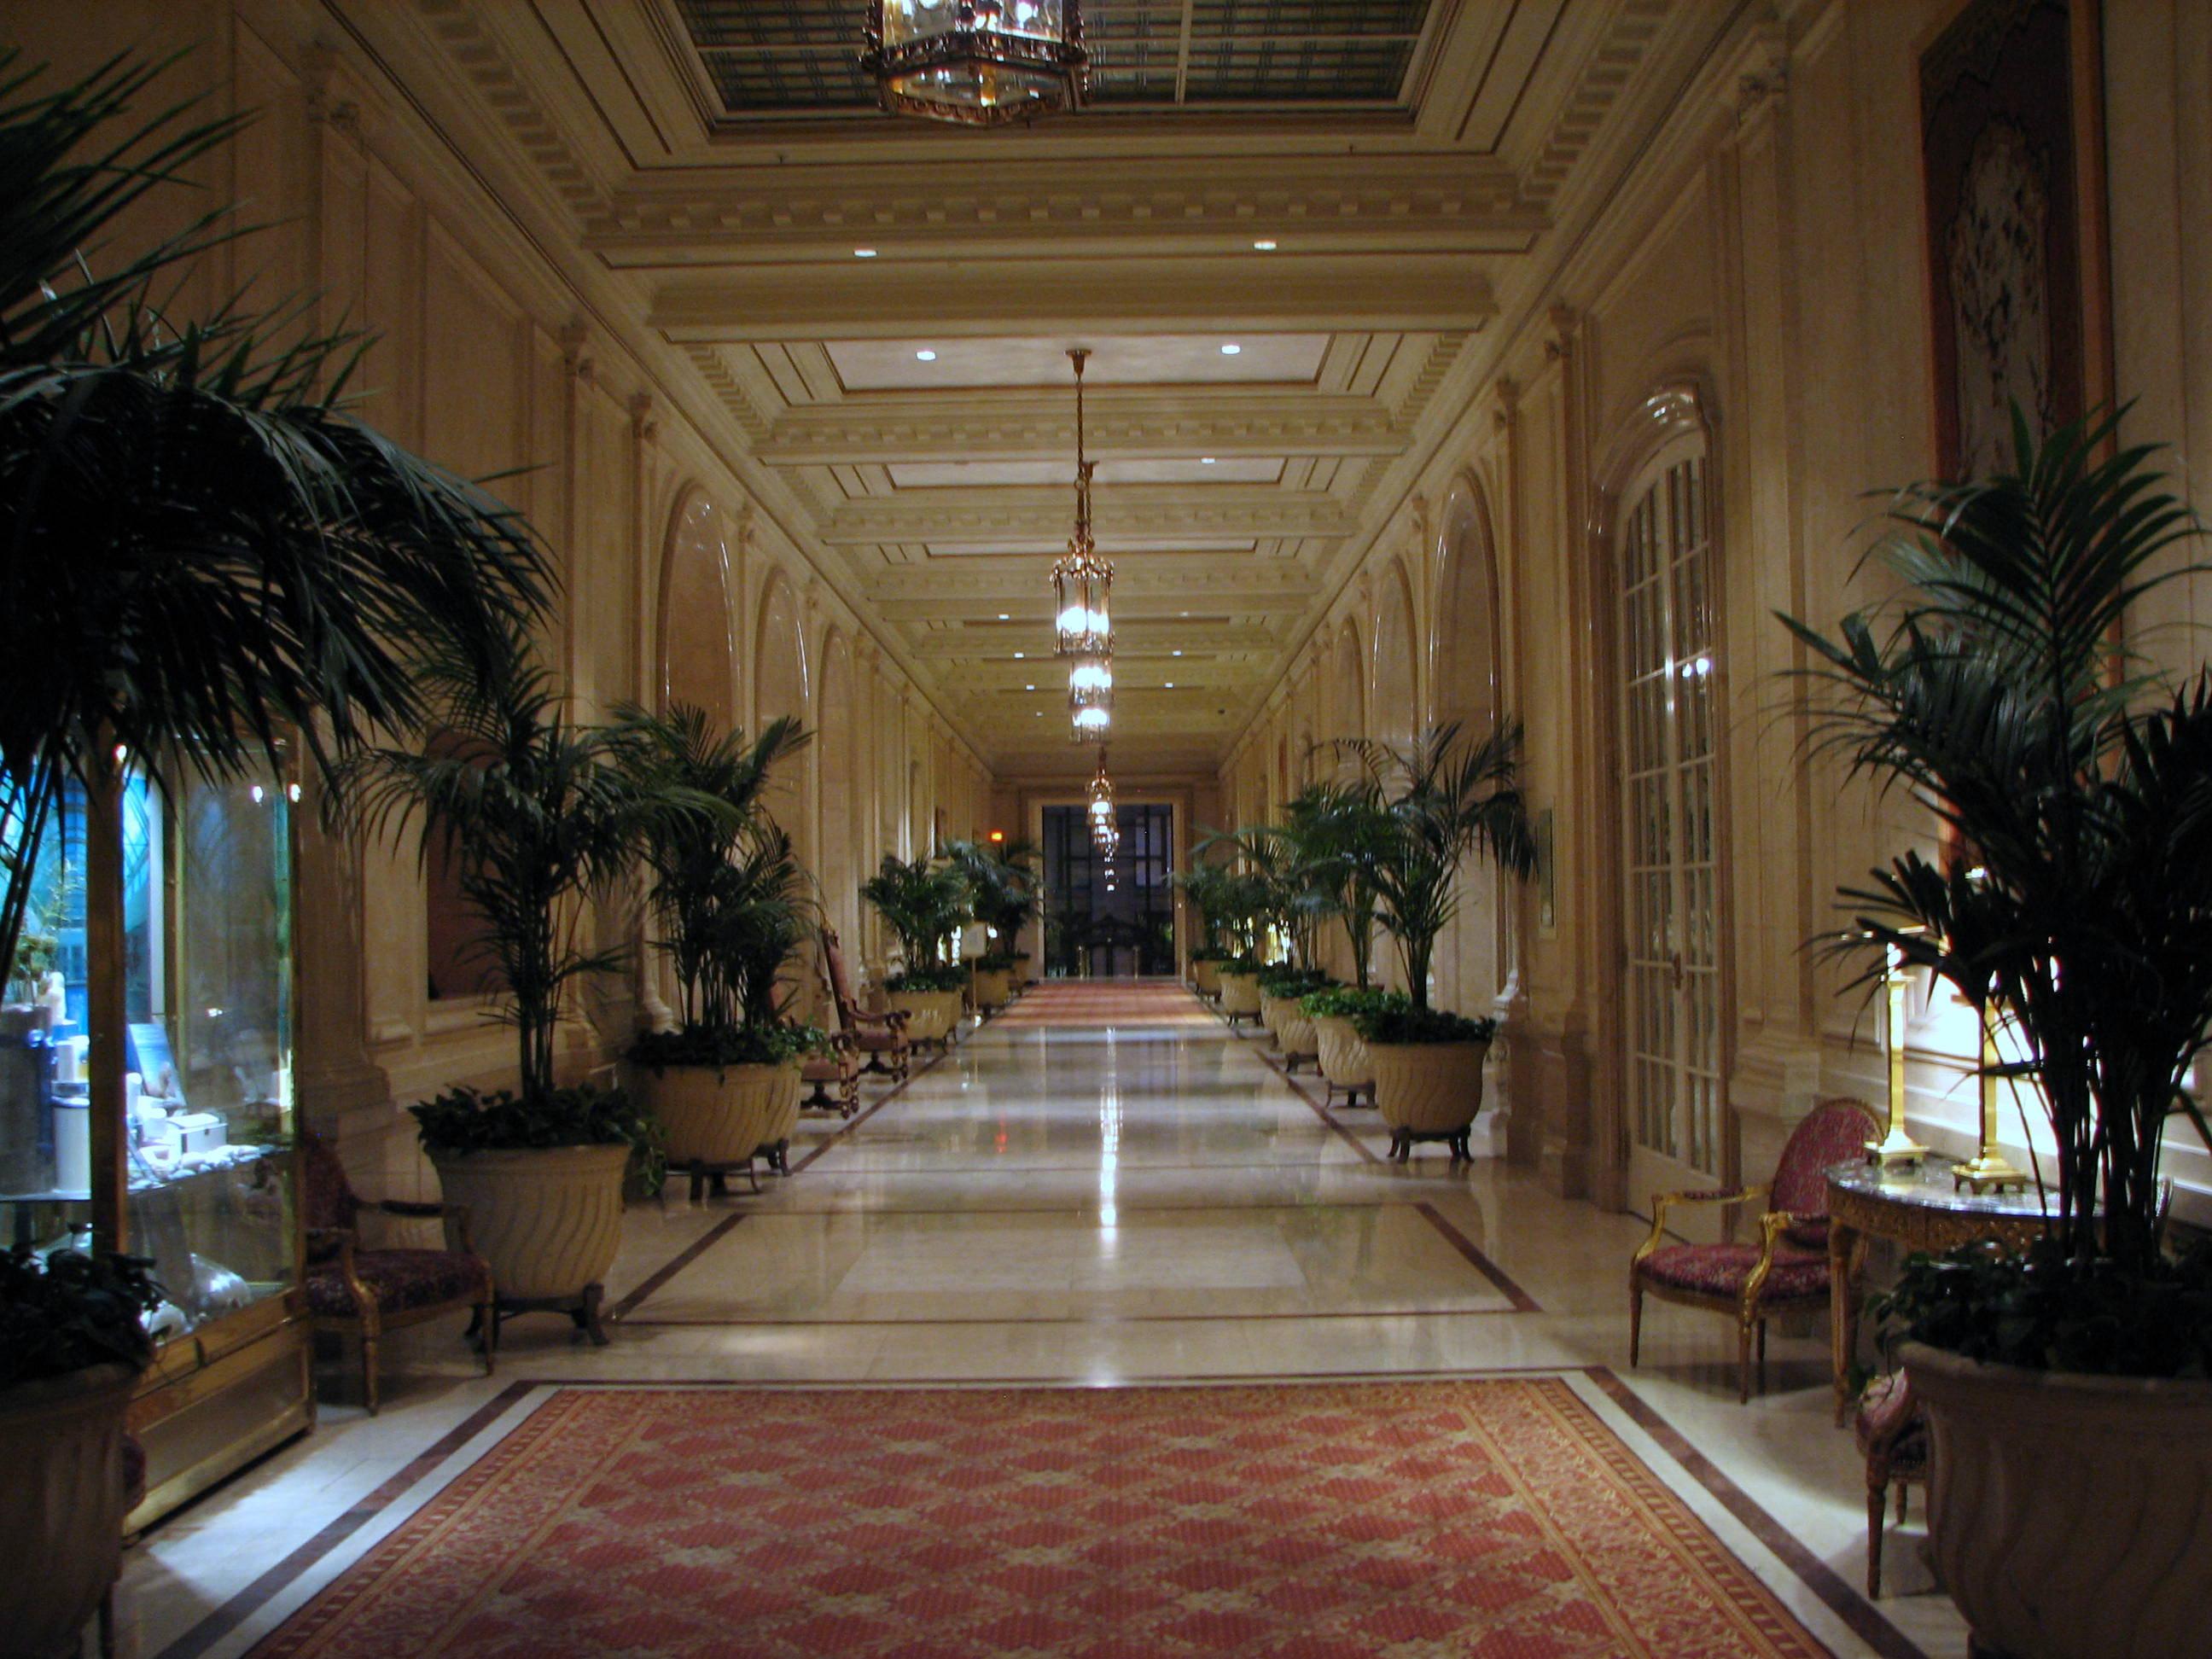 California Palace Hotel